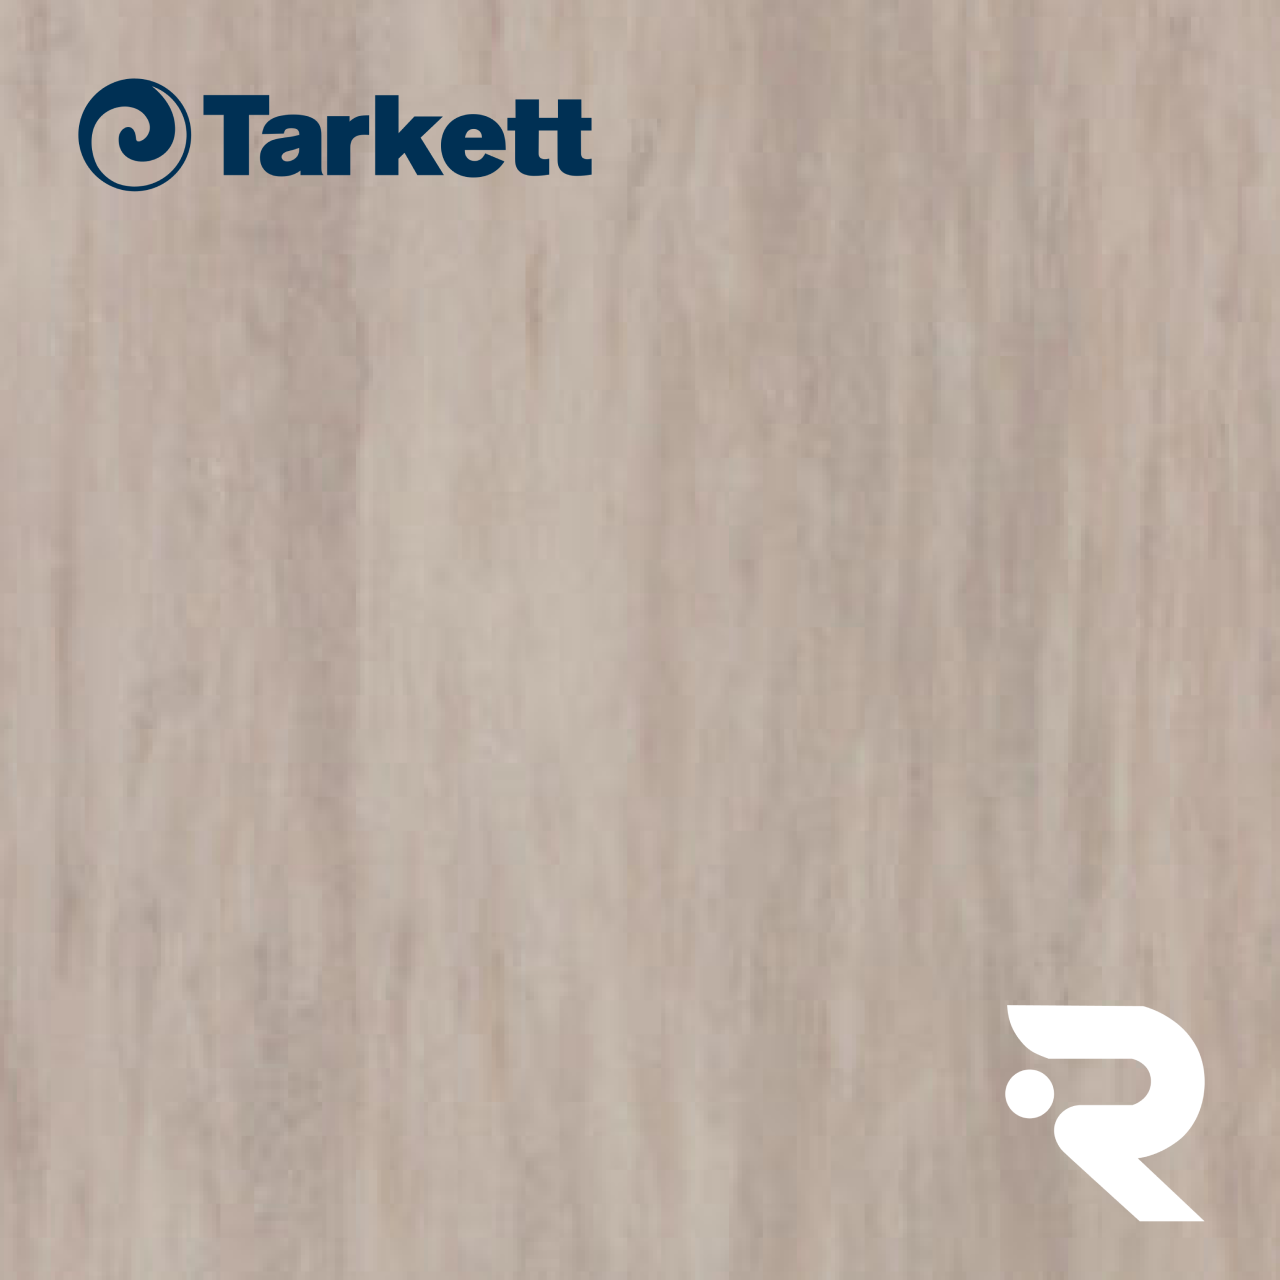 🏫 Гомогенный линолеум Tarkett | Standard MEDIUM WARM GREY 0911 | Standard Plus 2.0 mm | 610 х 610 мм